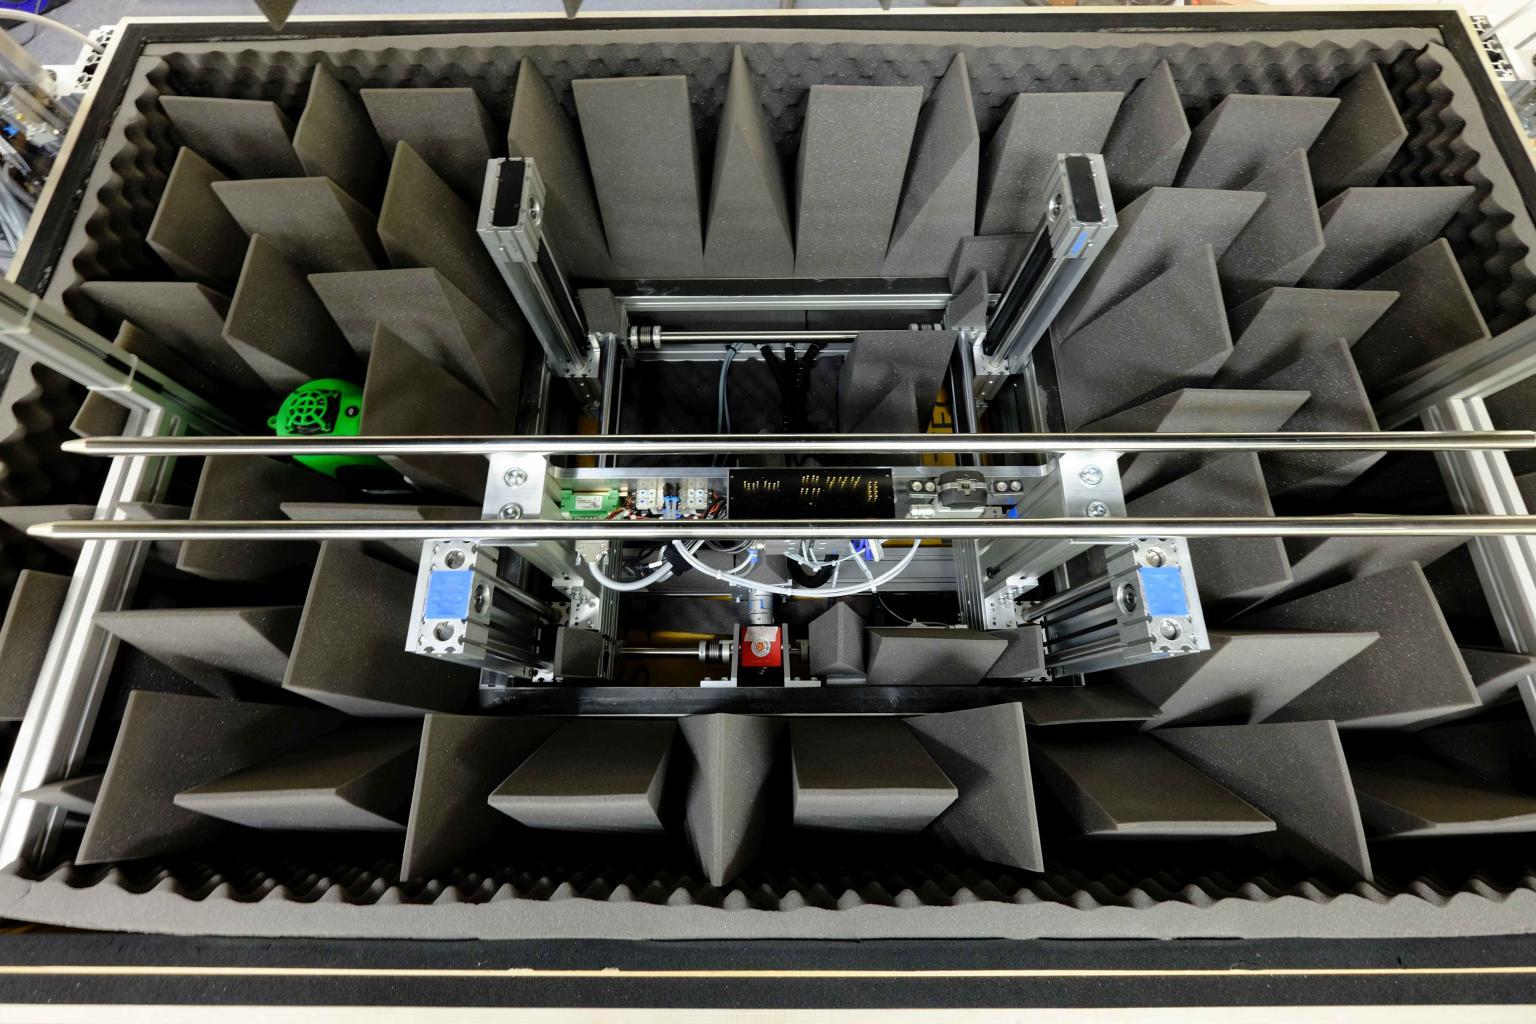 Carrier for unit-under-test inside chamber